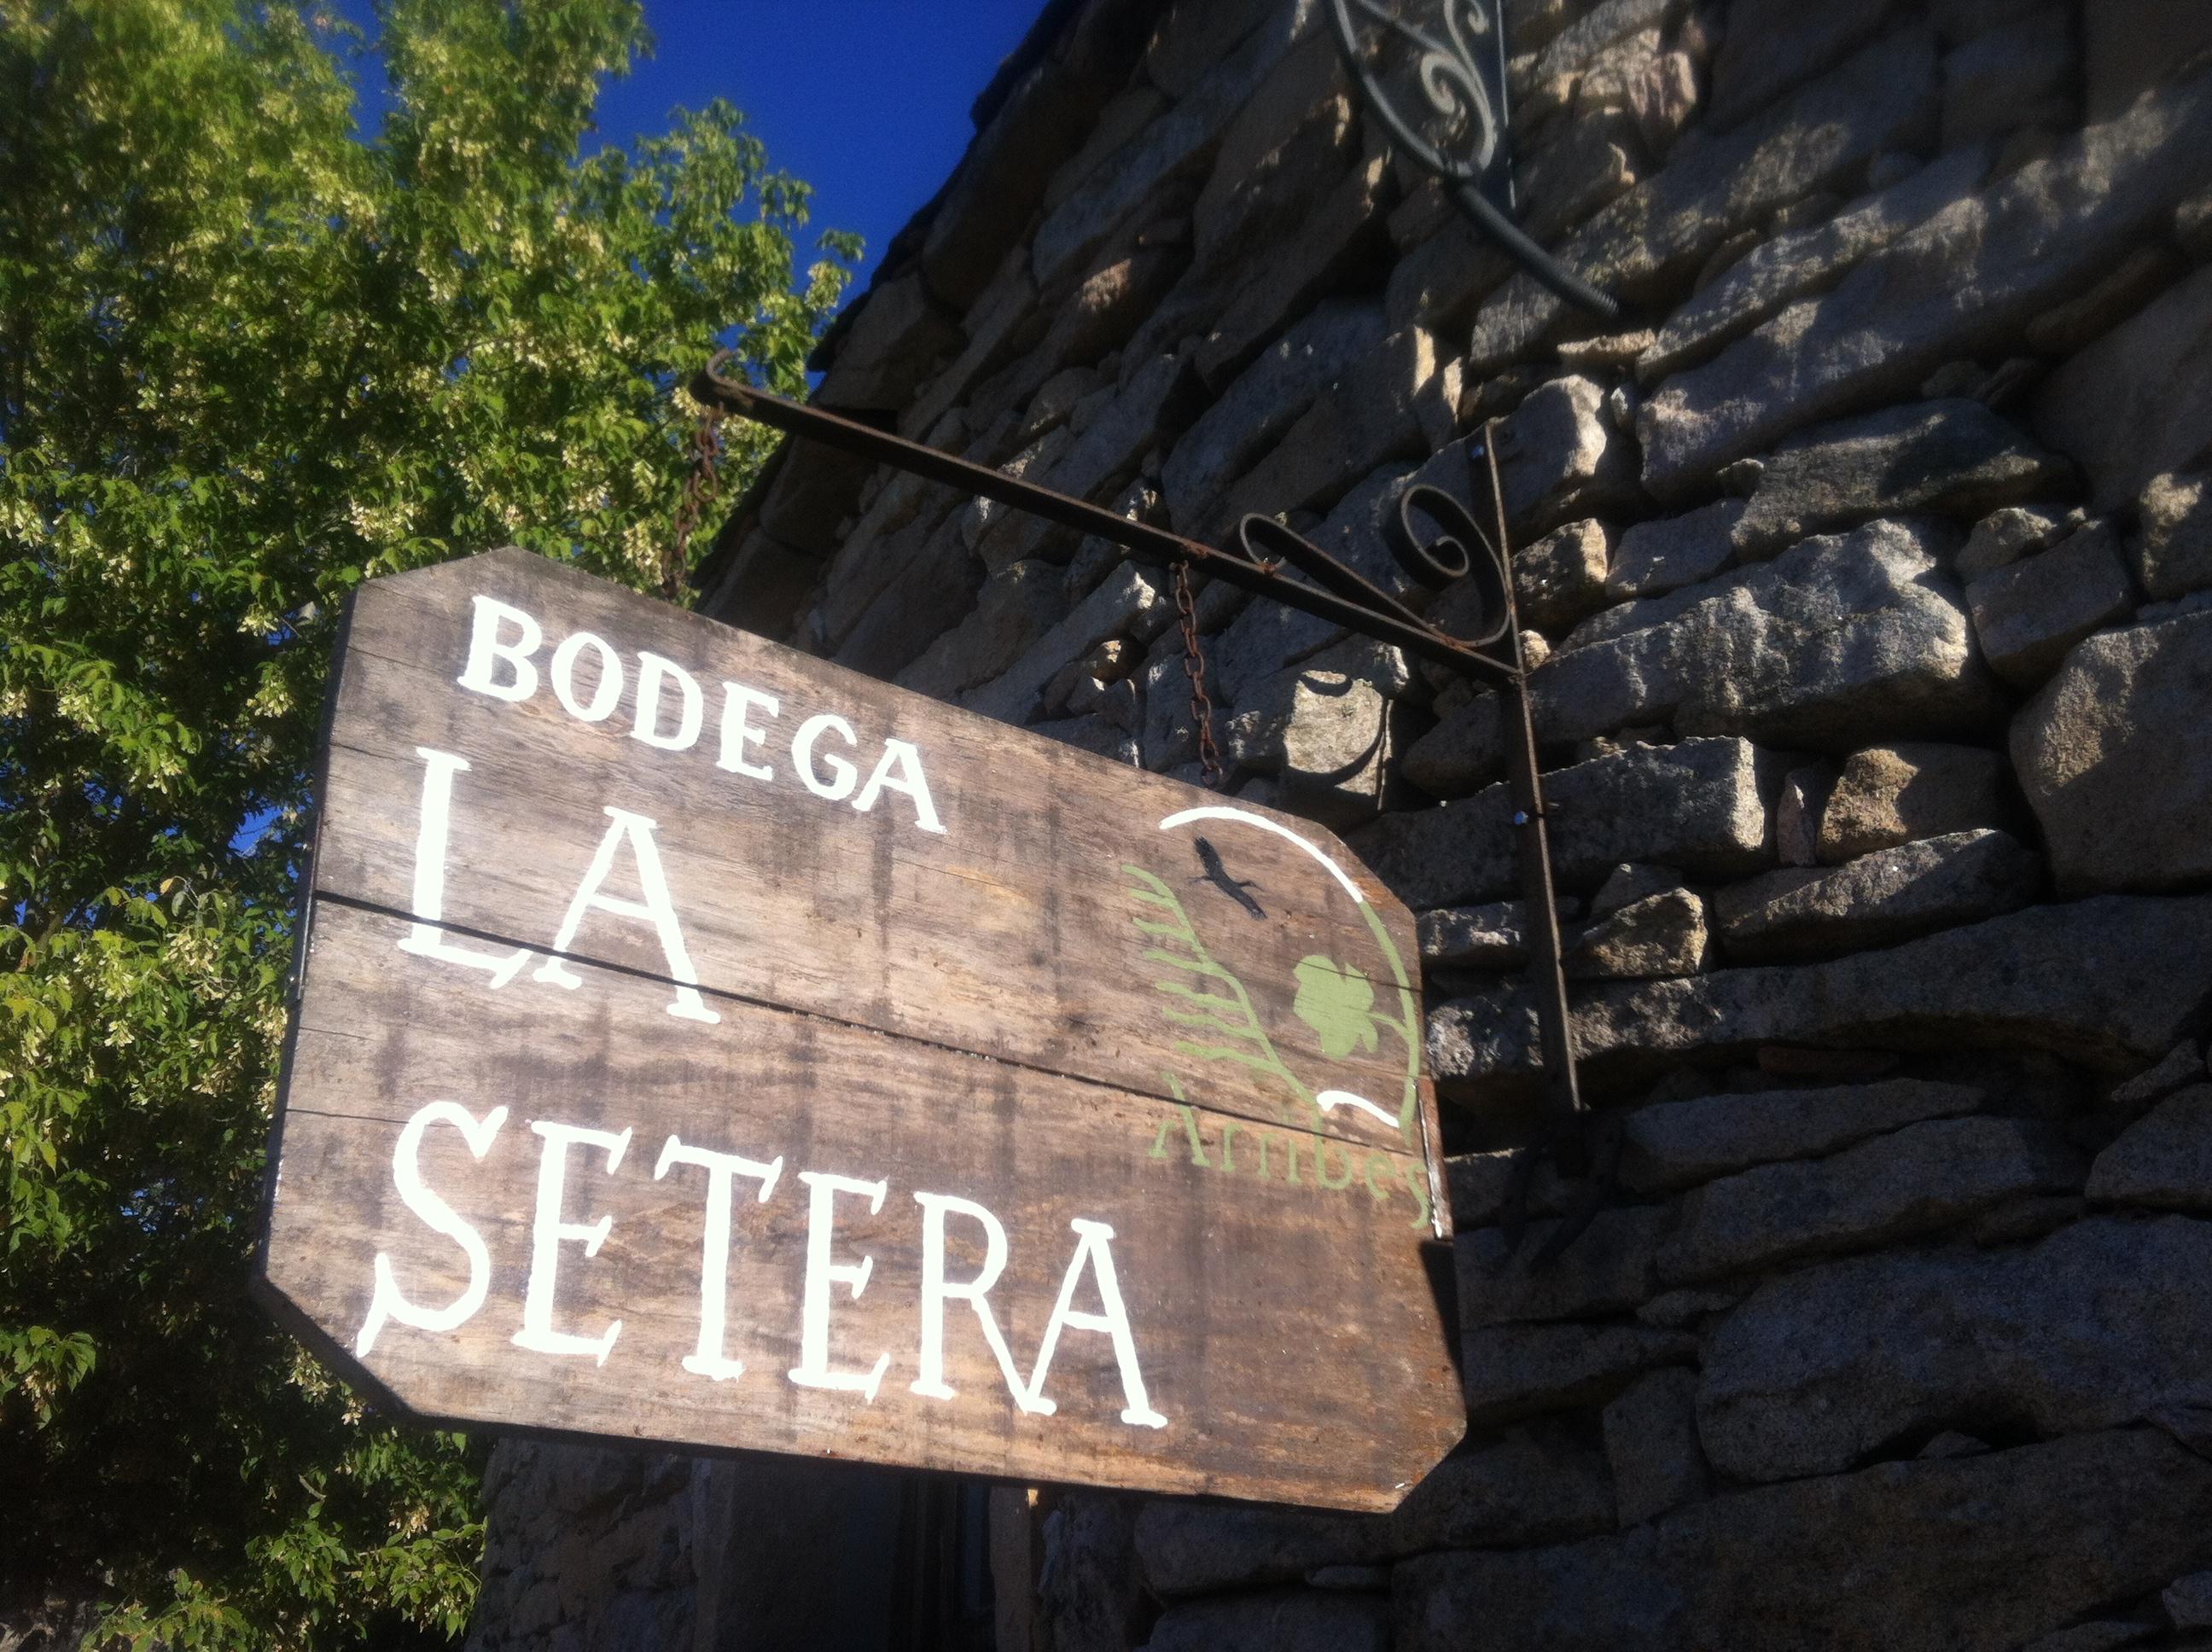 Bodega Quesería La Setera1